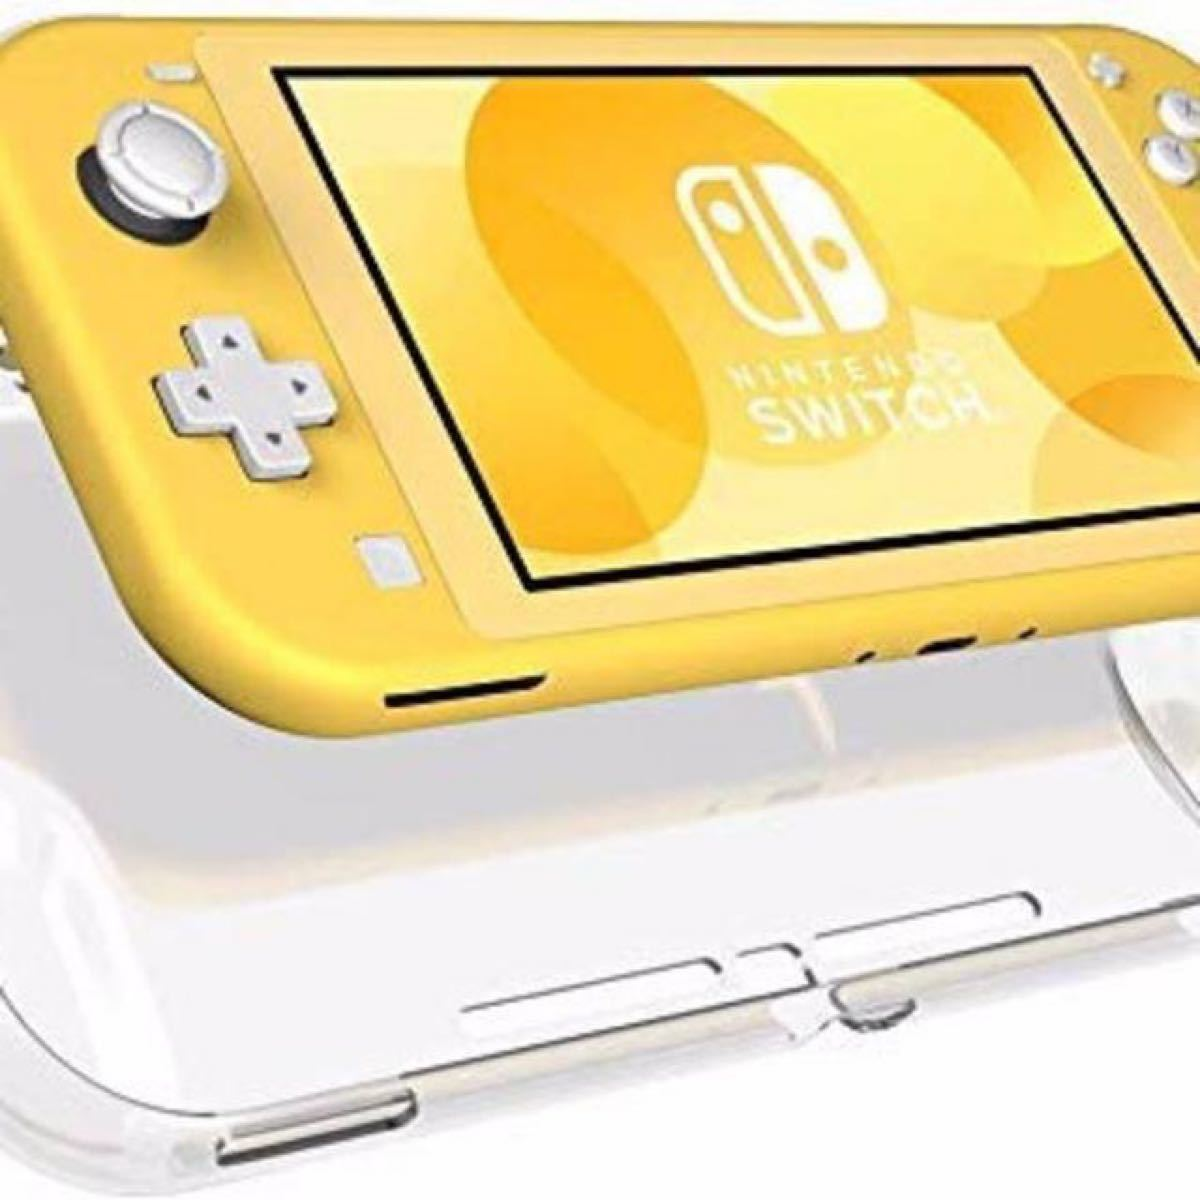 Nintendo Switch 任天堂スイッチ PS Vita 保護